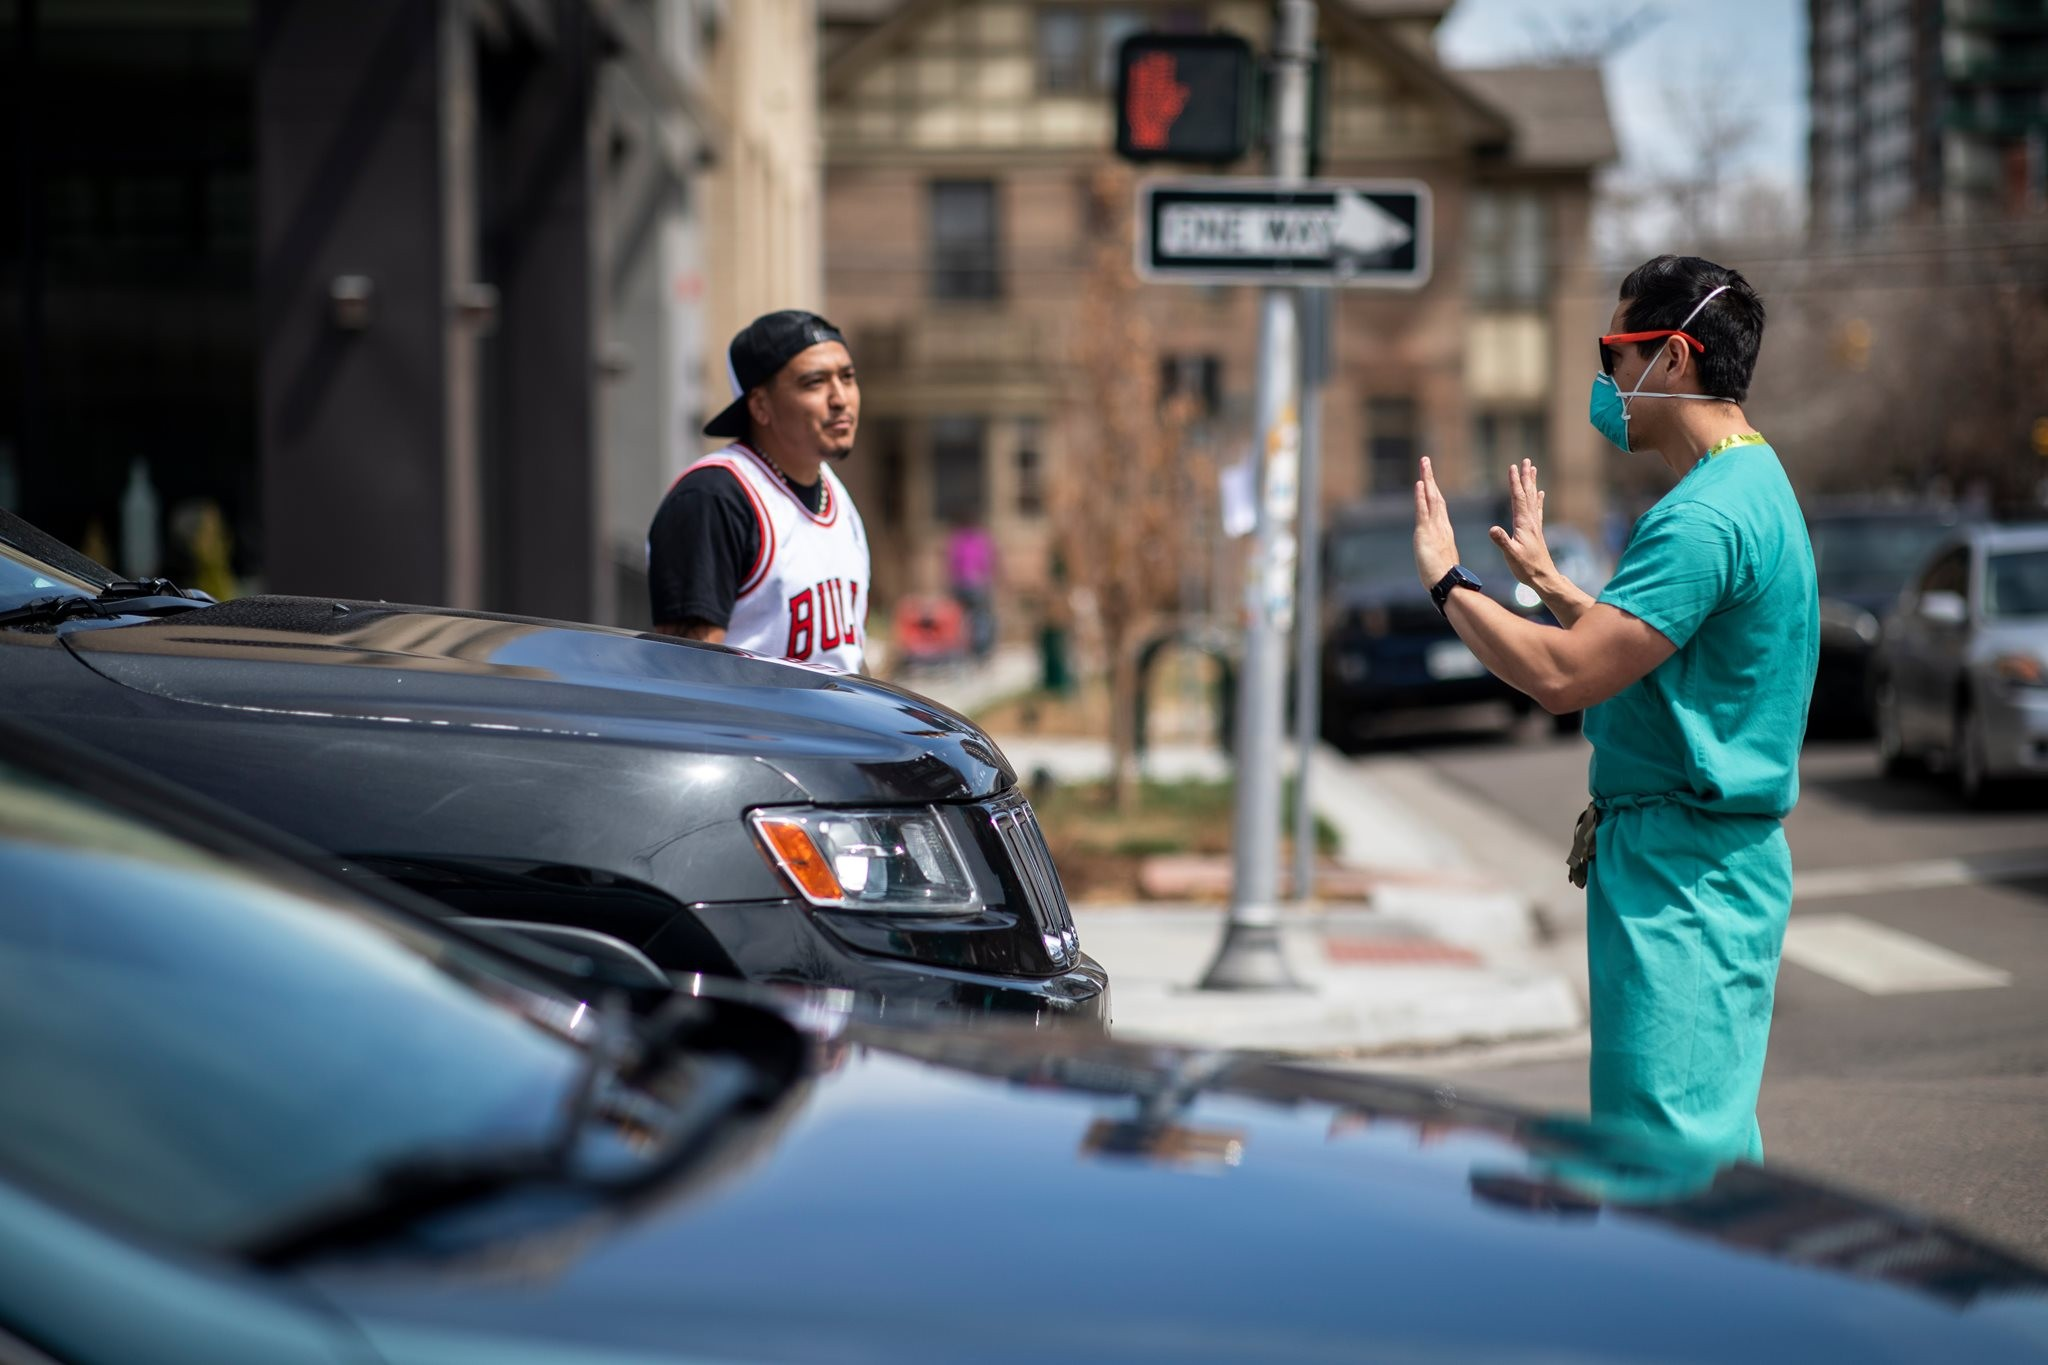 Profissional da saúde pedindo respeito (Foto: Alysson McClaran)